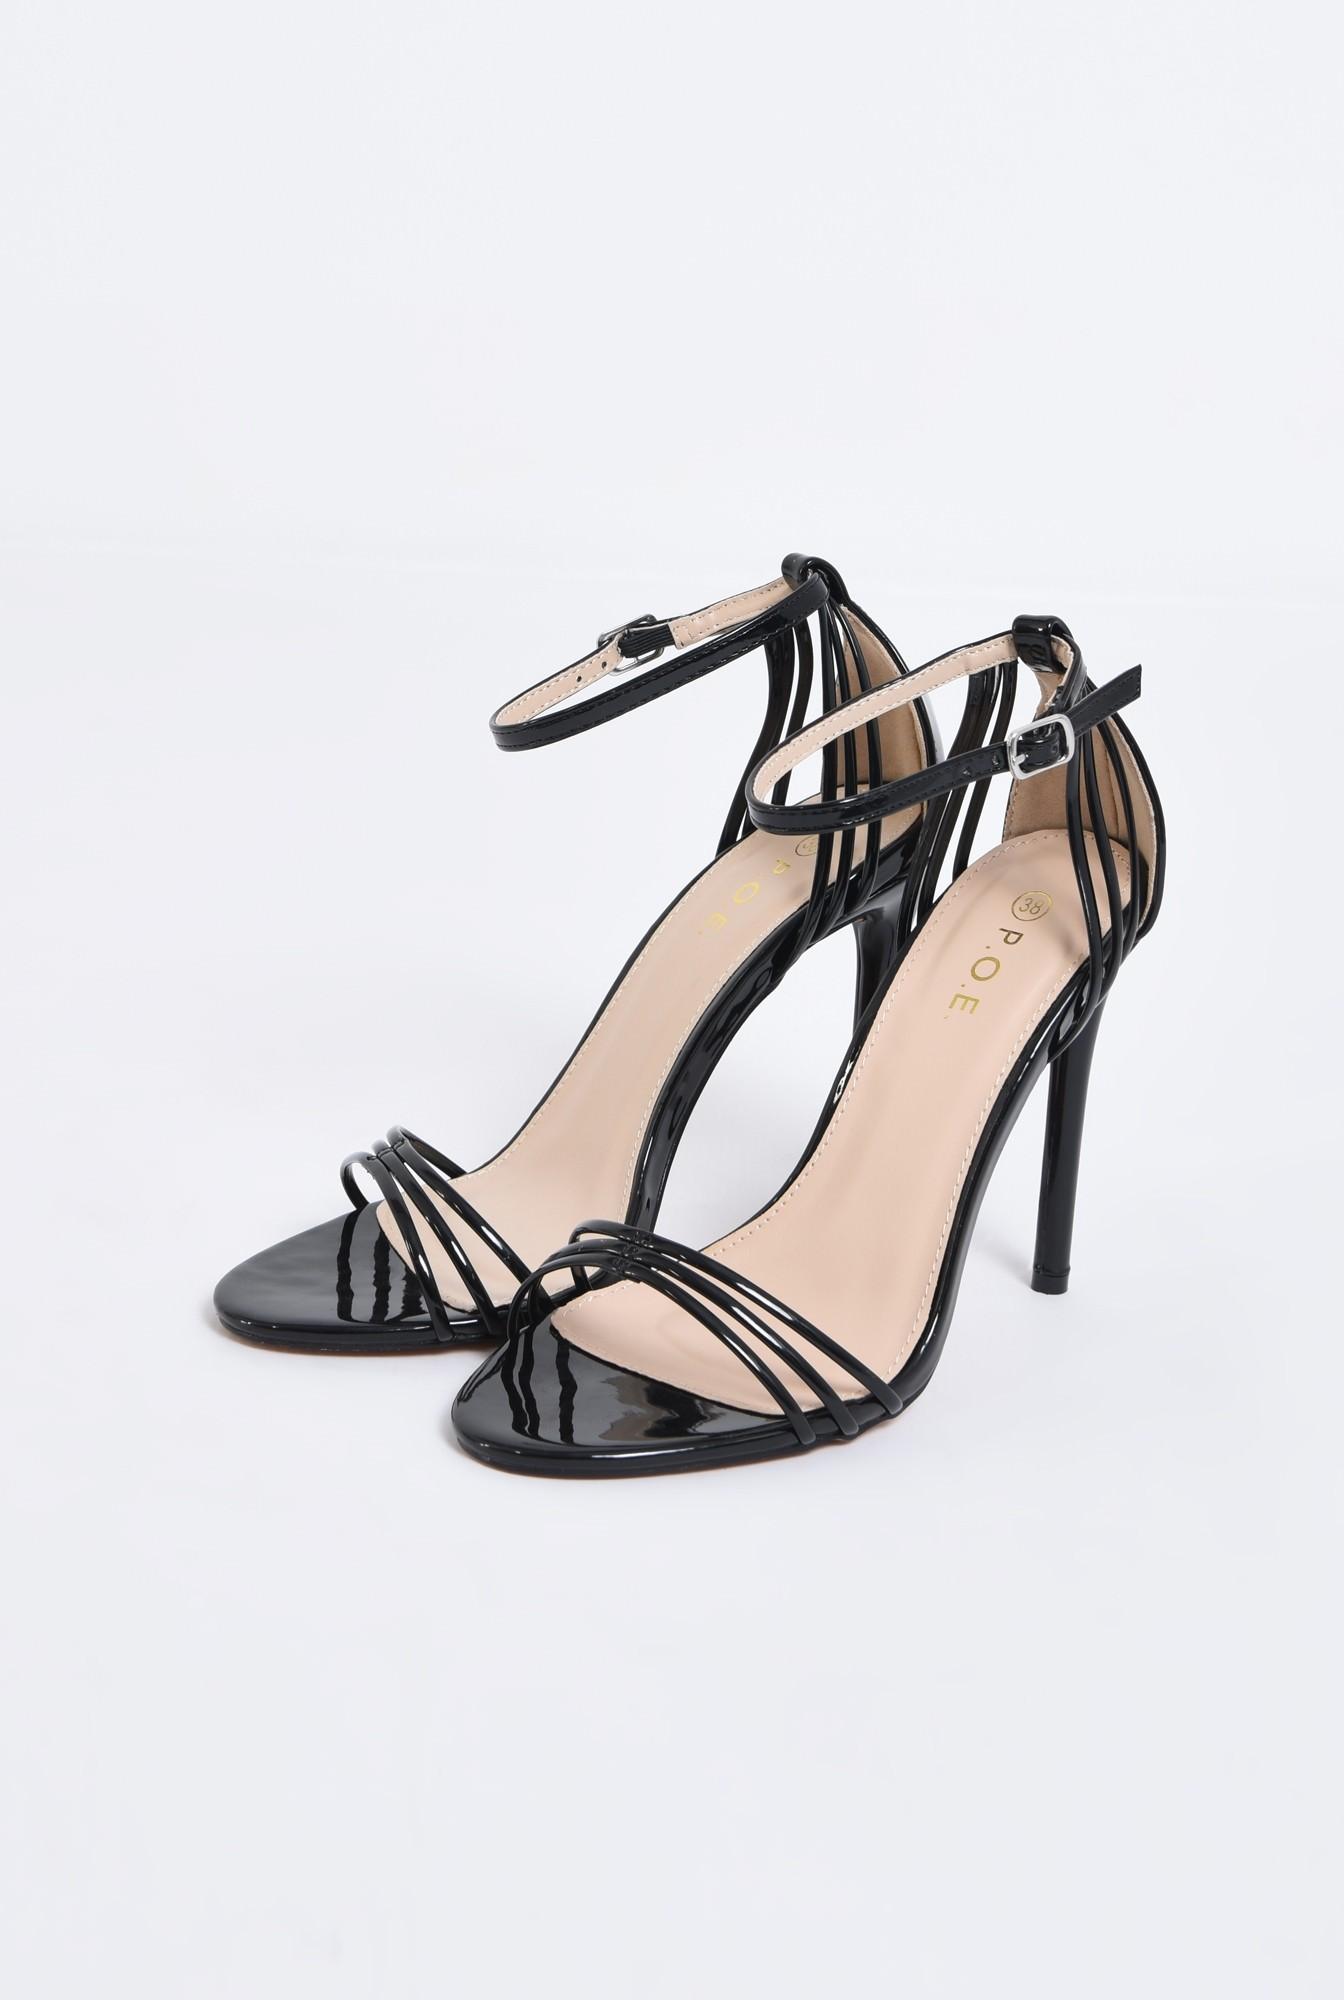 1 - sandale elegante, din lac, negre, toc stiletto